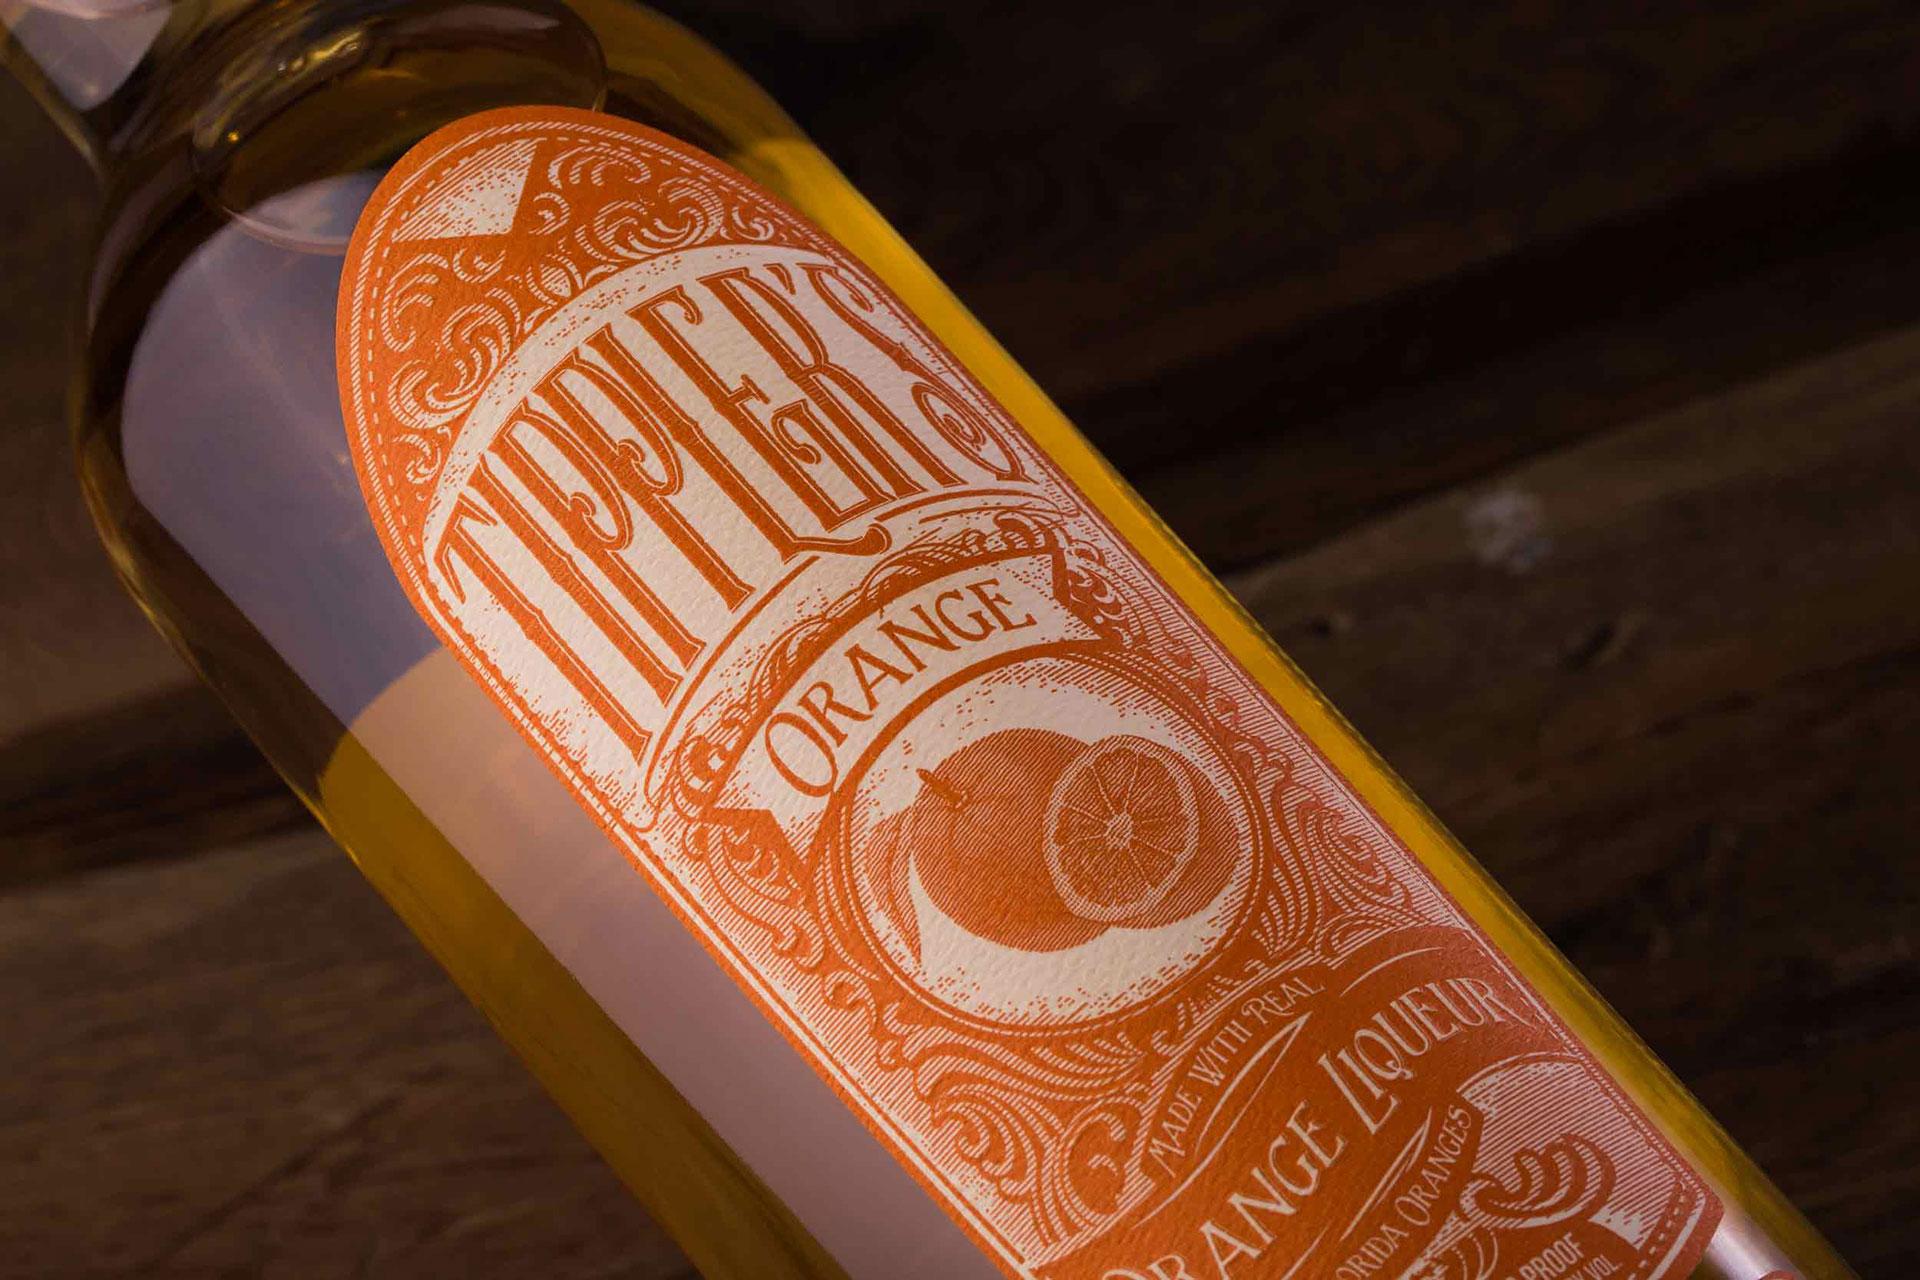 Tippler's Orange Liqueur Label - PaperSpecs